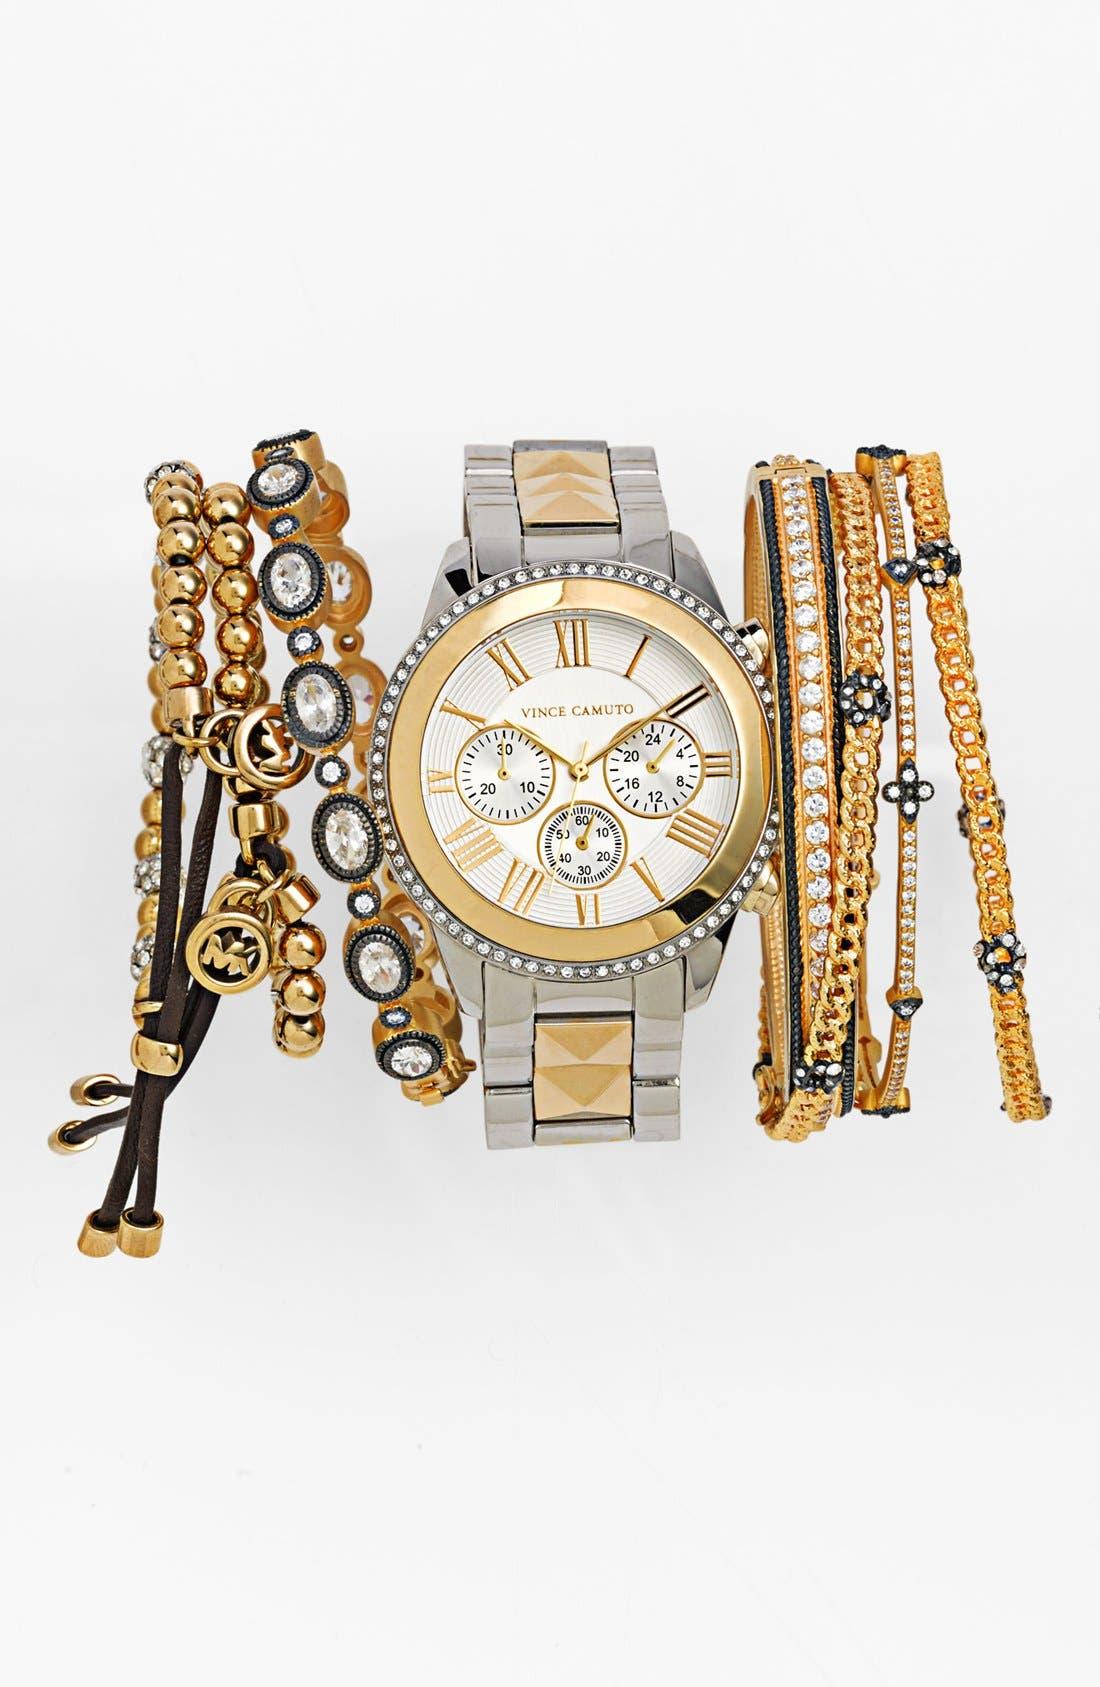 Main Image - Vince Camuto Watch & Michael Kors Bracelets